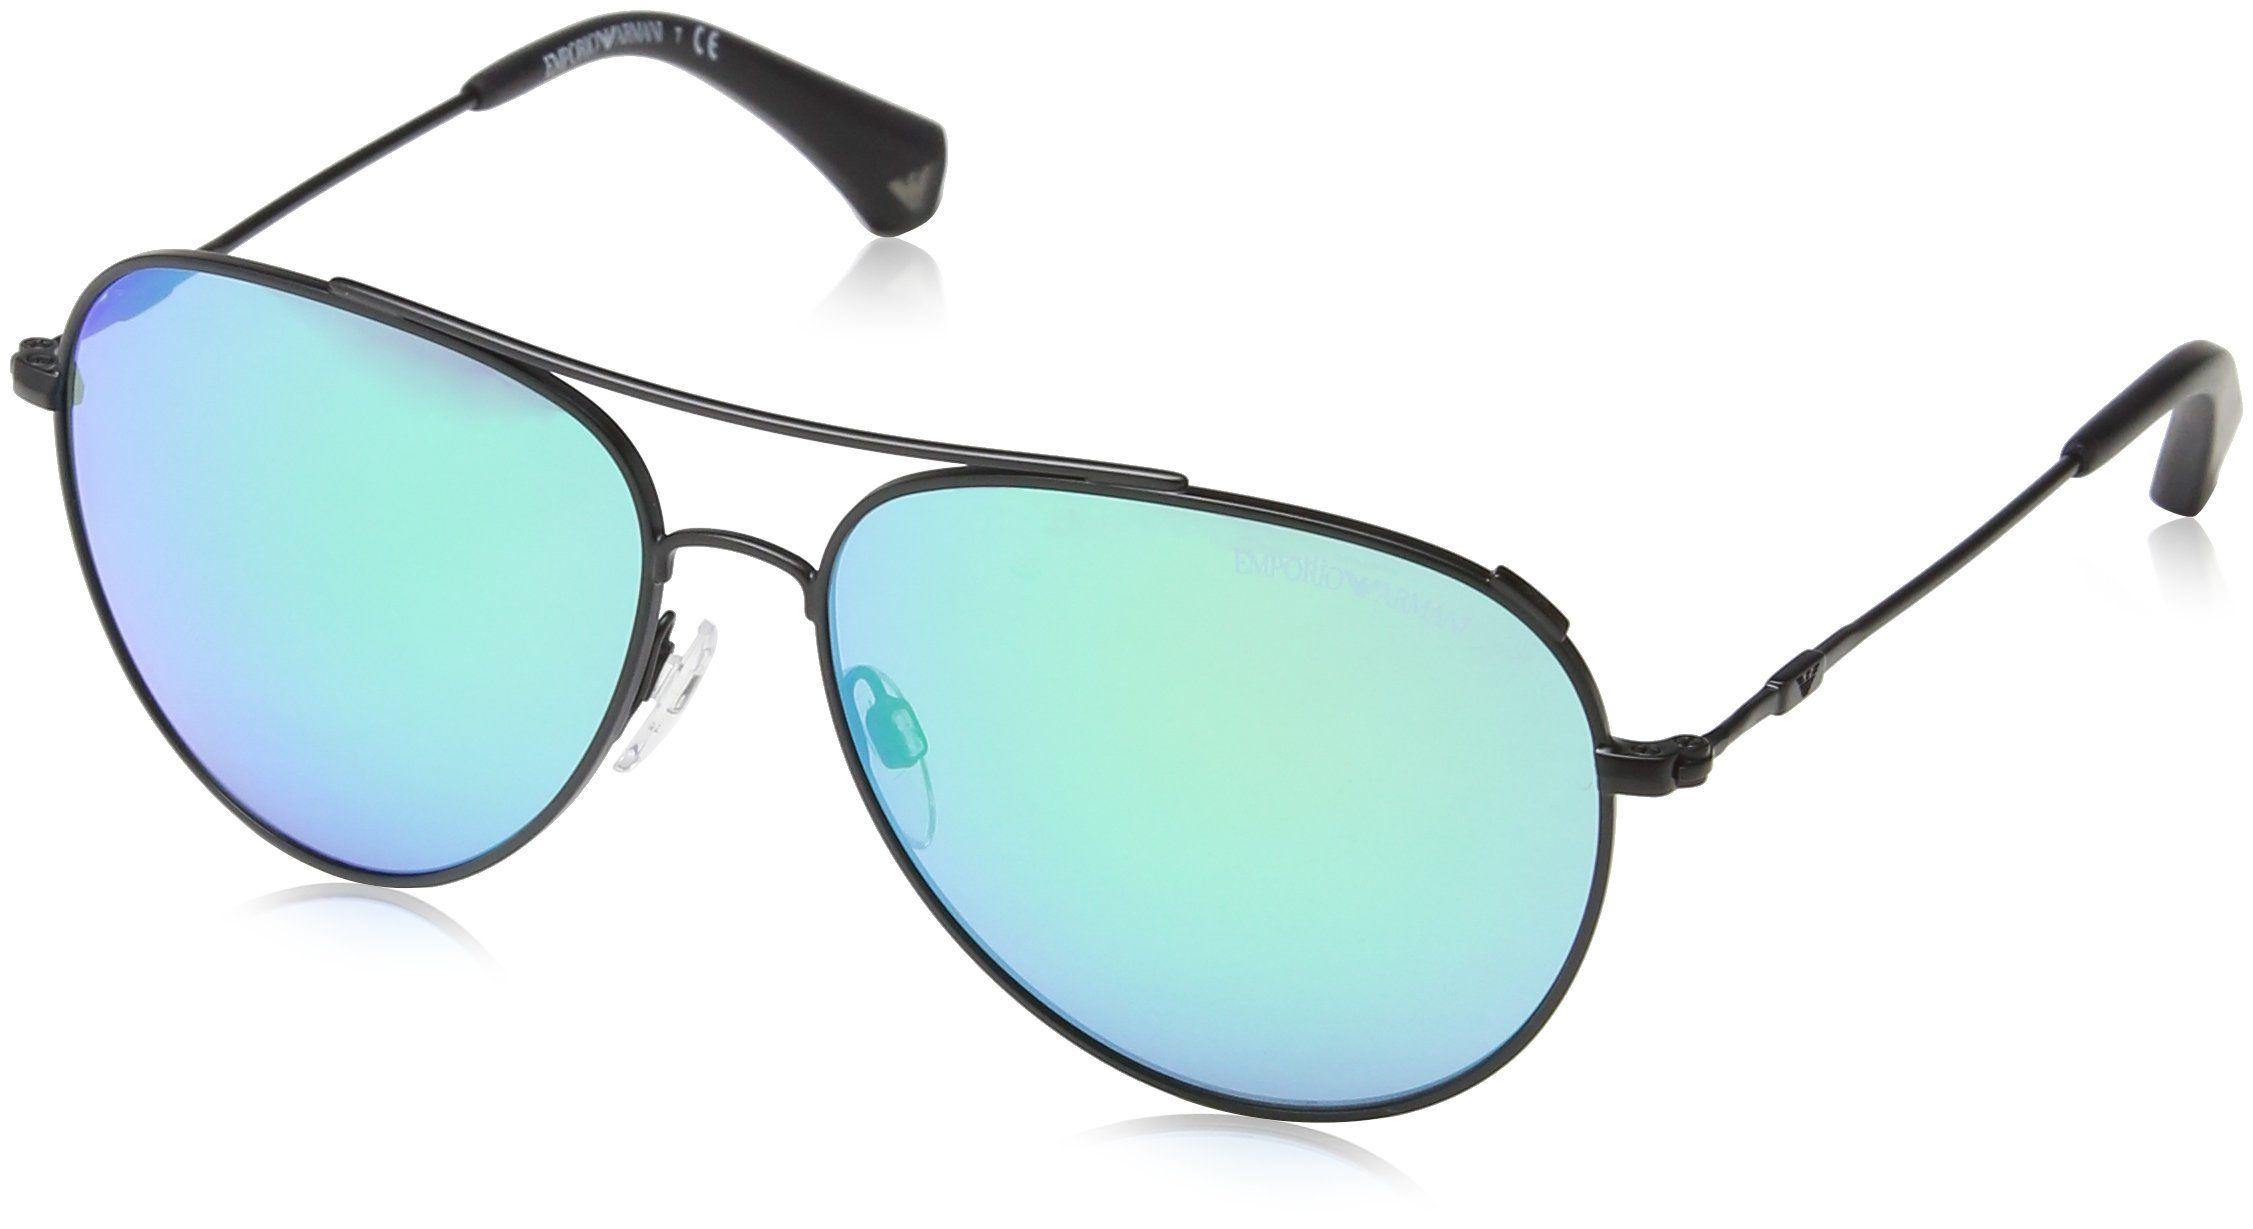 Emporio Armani EA2010 Matte Black Aviator Sunglasses. Included Content: Original Case, Cleaning Cloth and Booklet.